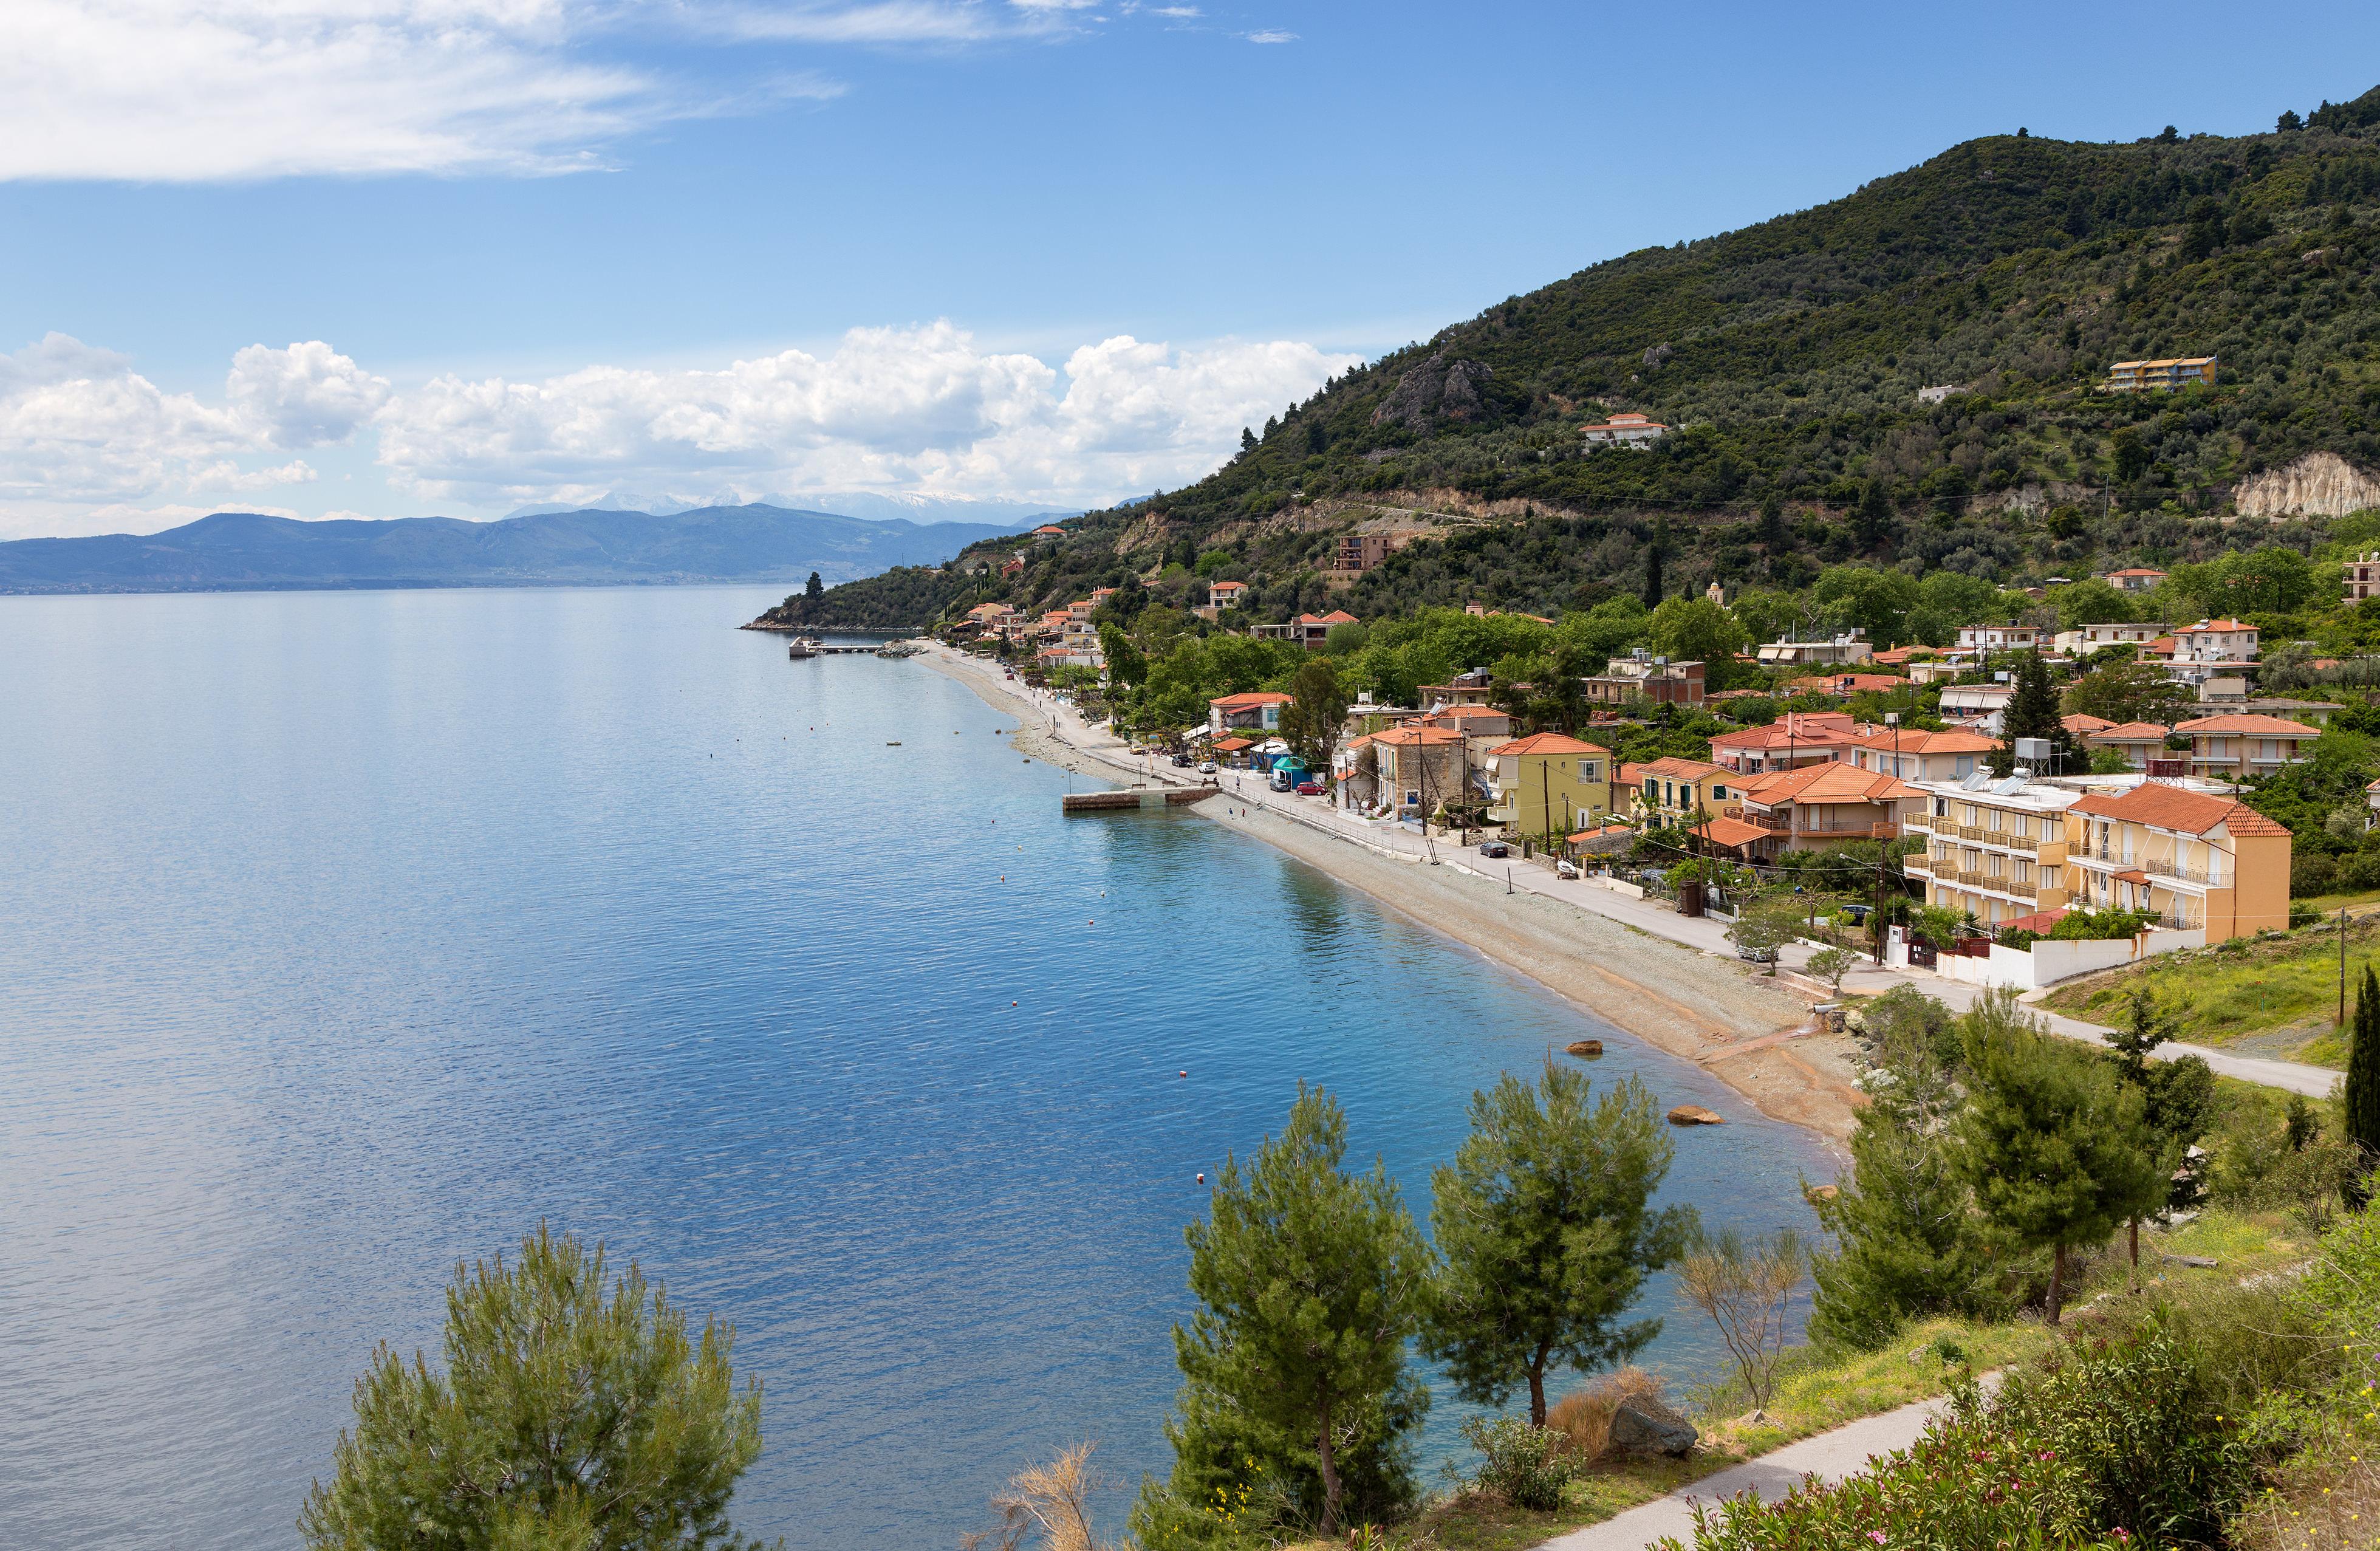 Ilia is a picturesque village in North Euboea, Greece.